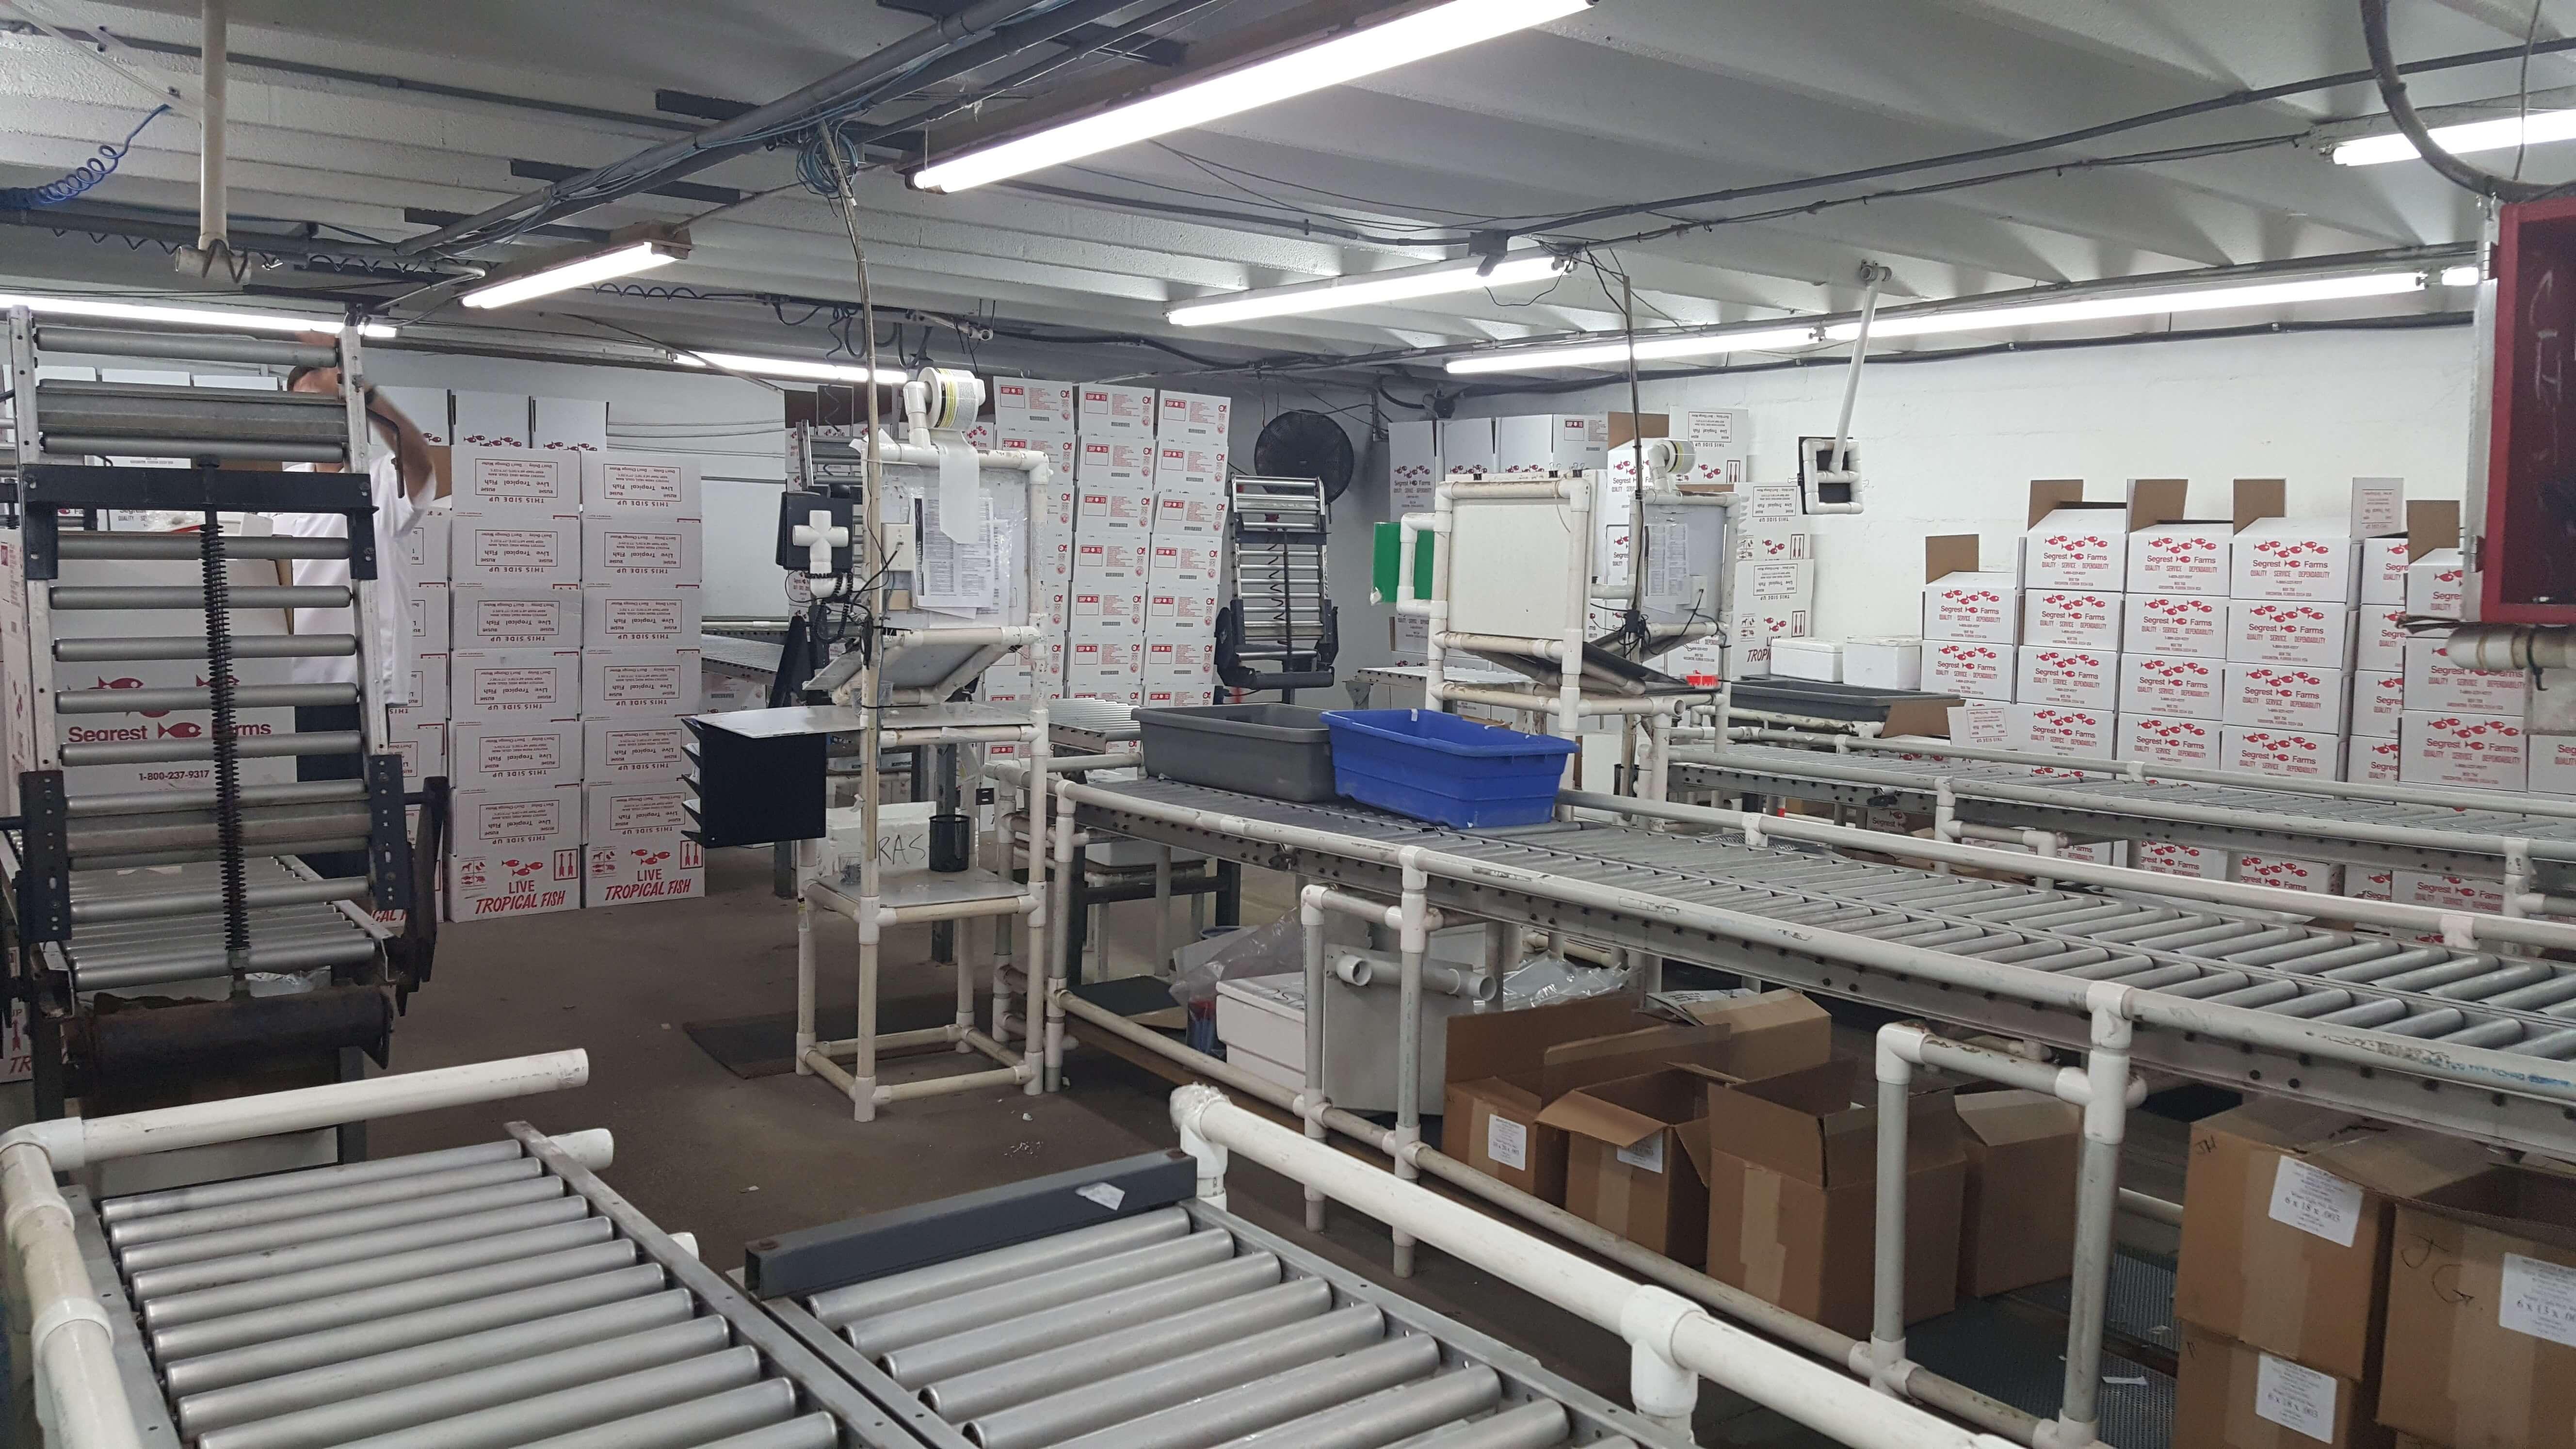 Segrest Farms Distribution Center